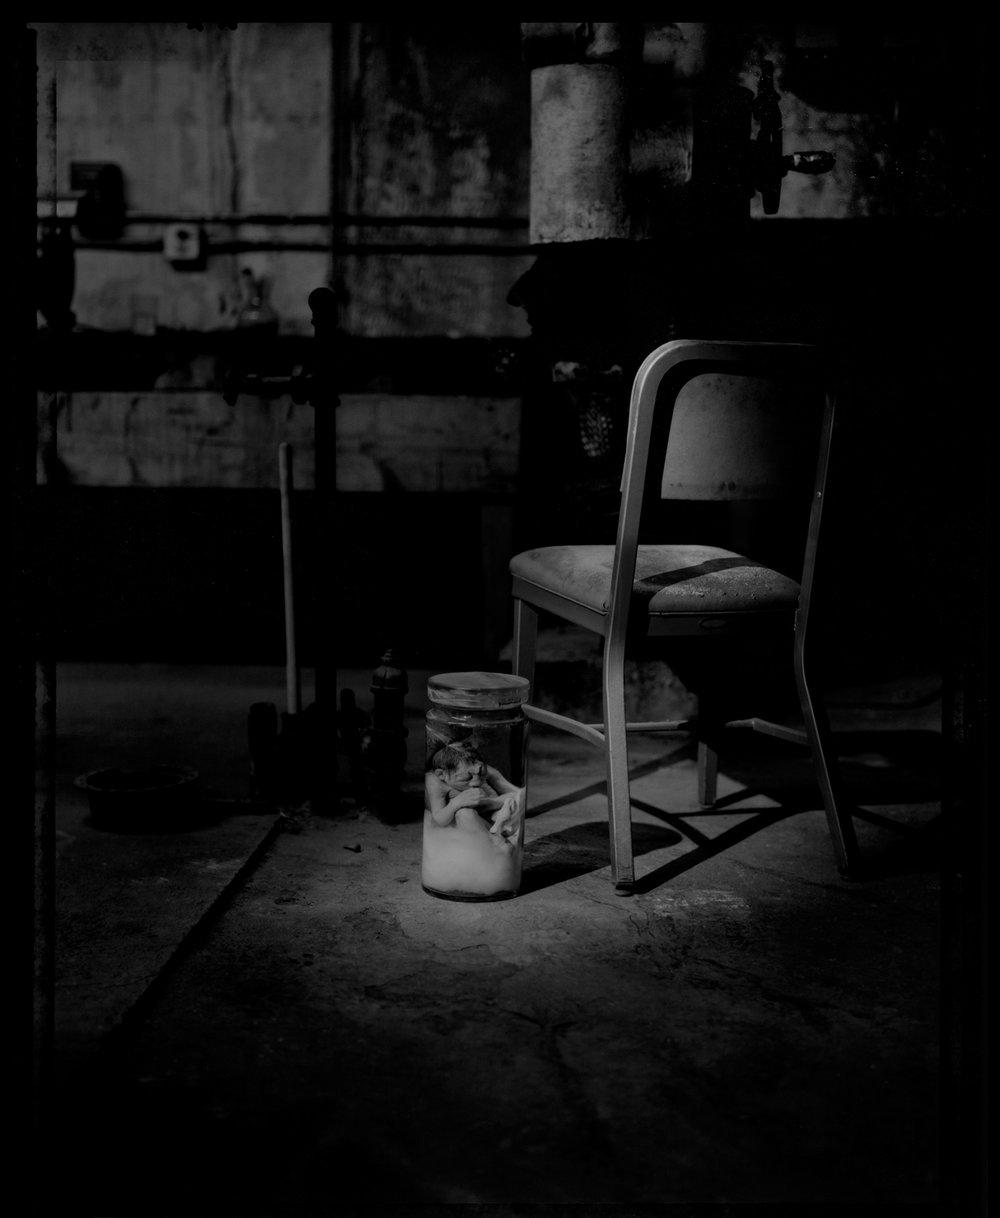 fetus in jar in basement-Recovered.jpg